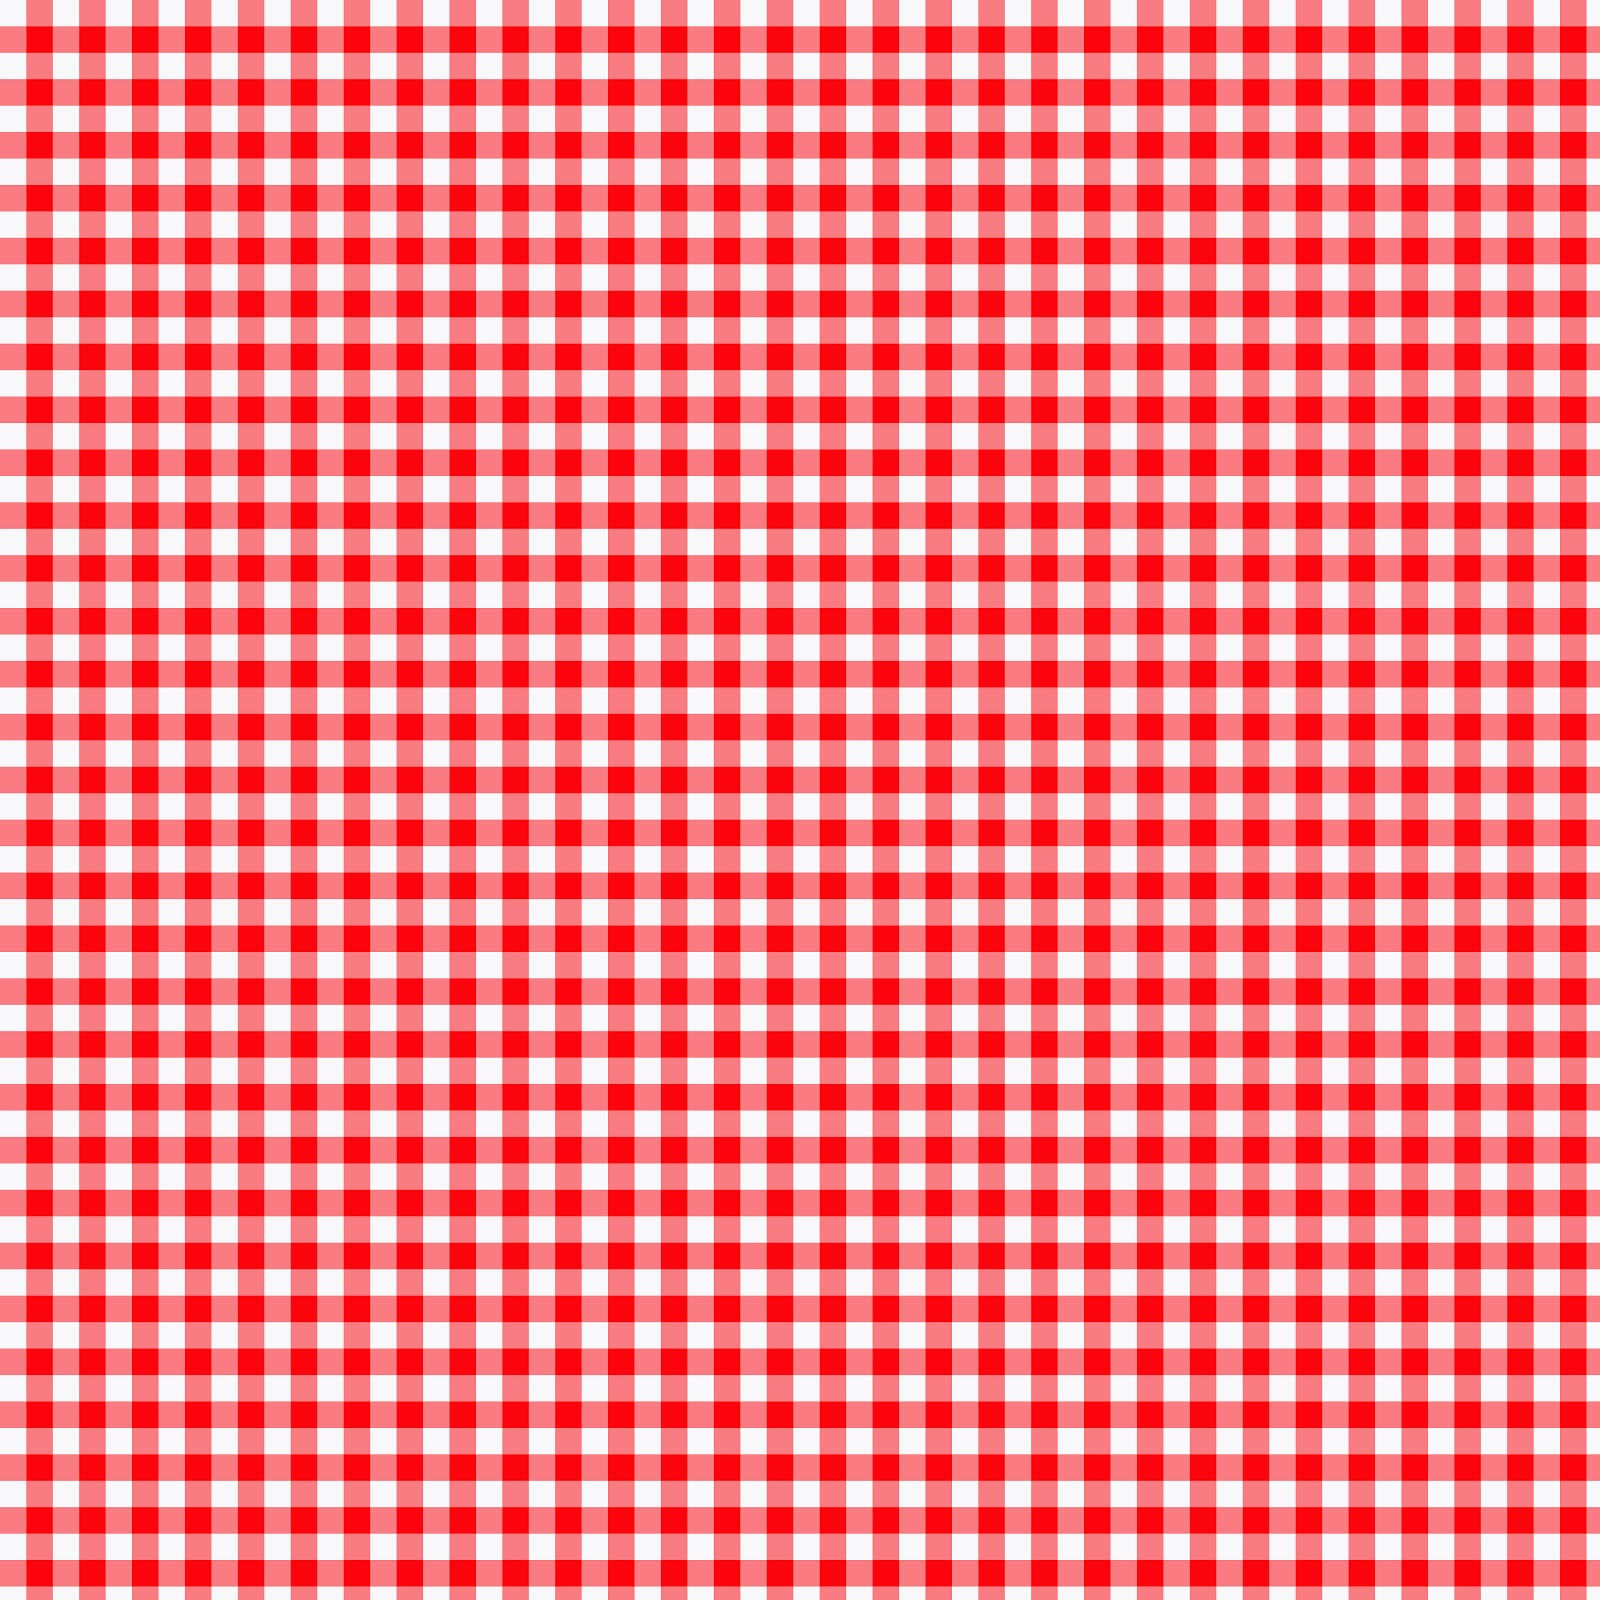 red and white gingham wallpaper wallpapersafari